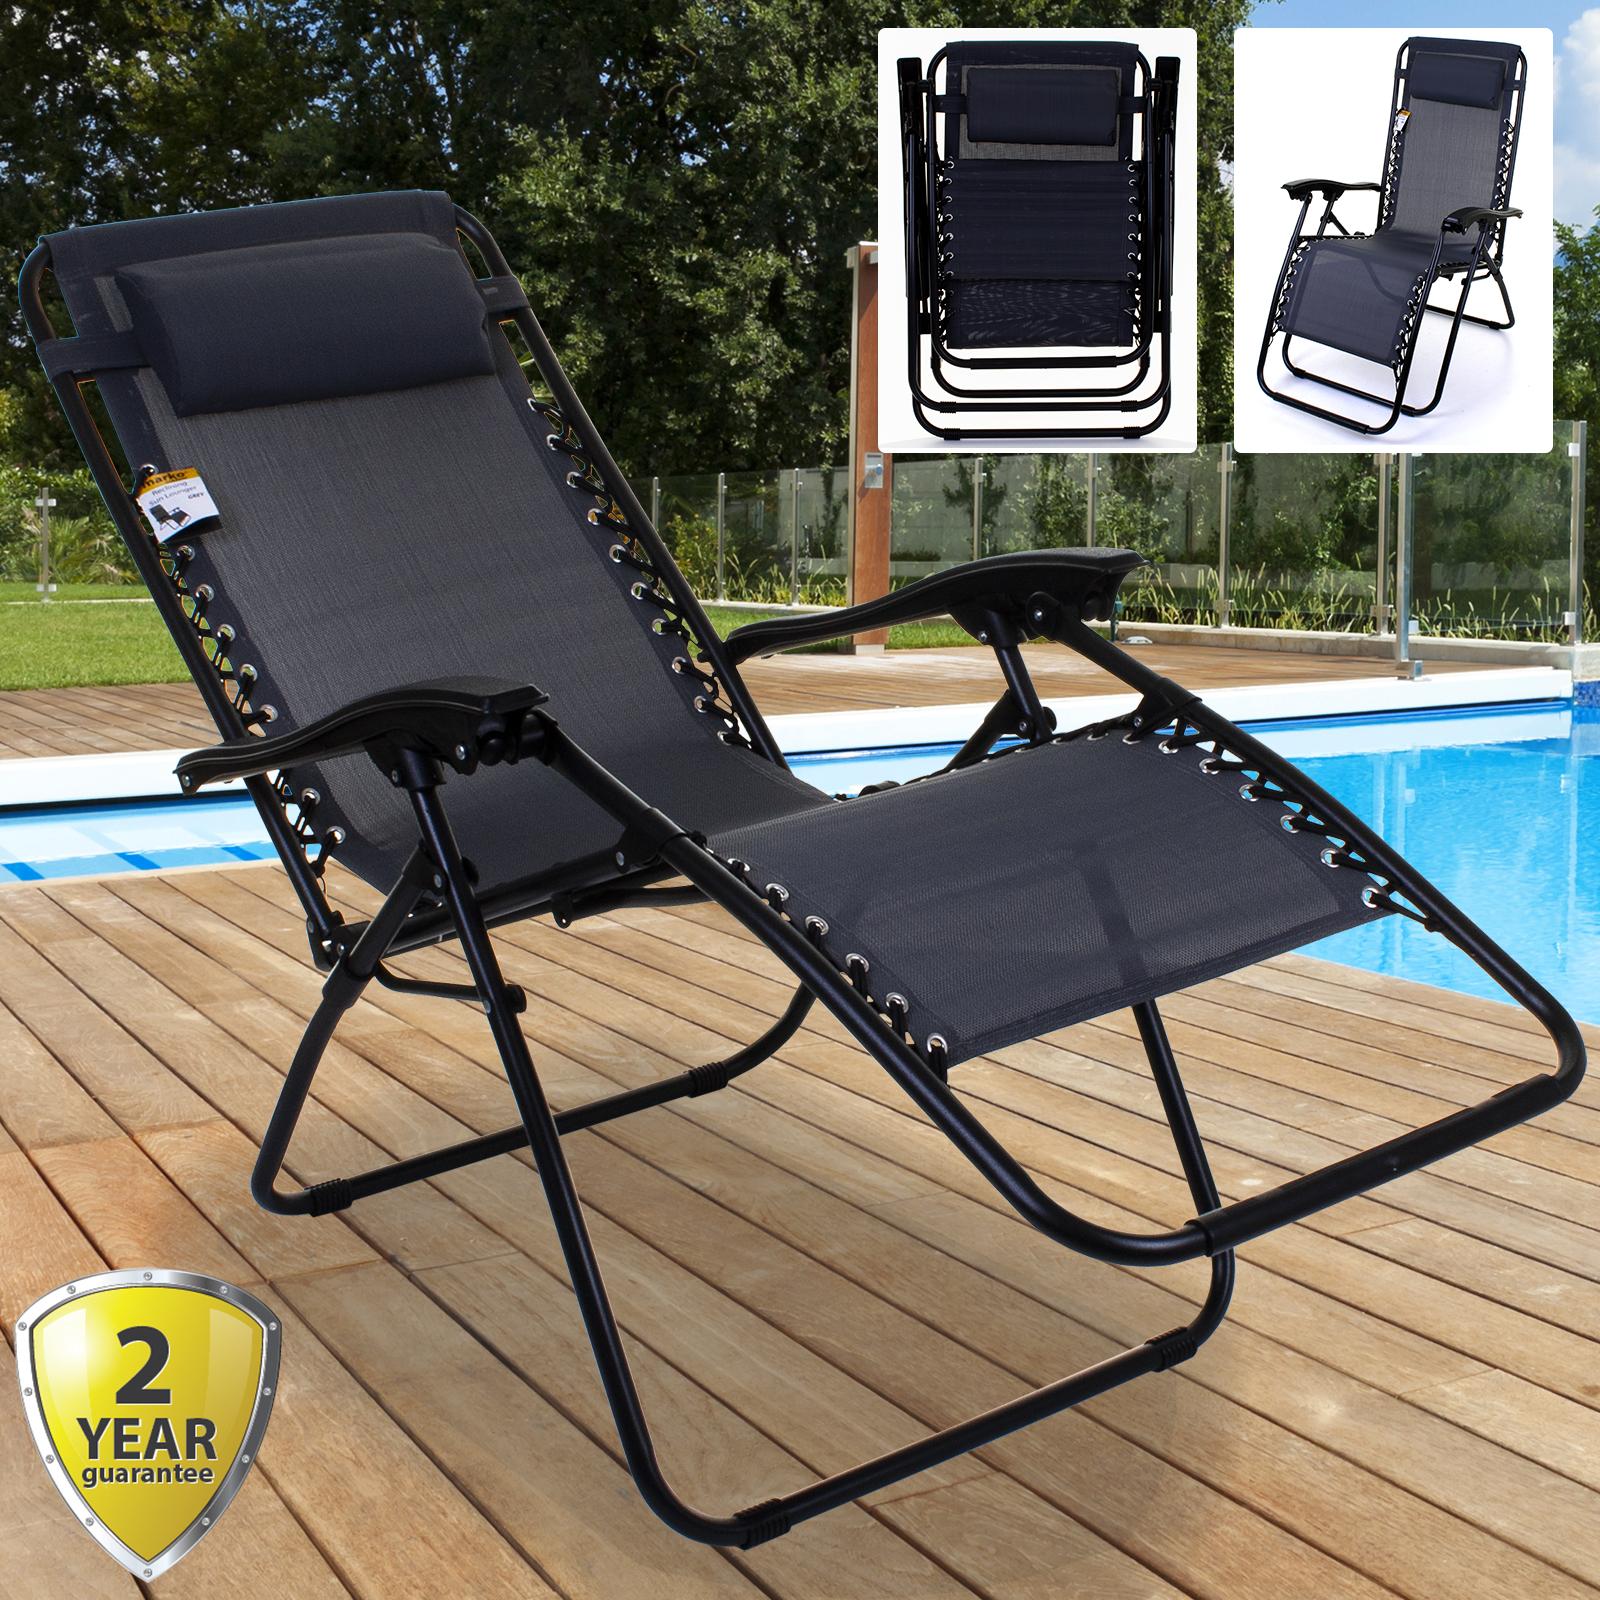 Zero Gravity Textoline Reclining Sun Lounger Chair Folding Garden Bed Grey